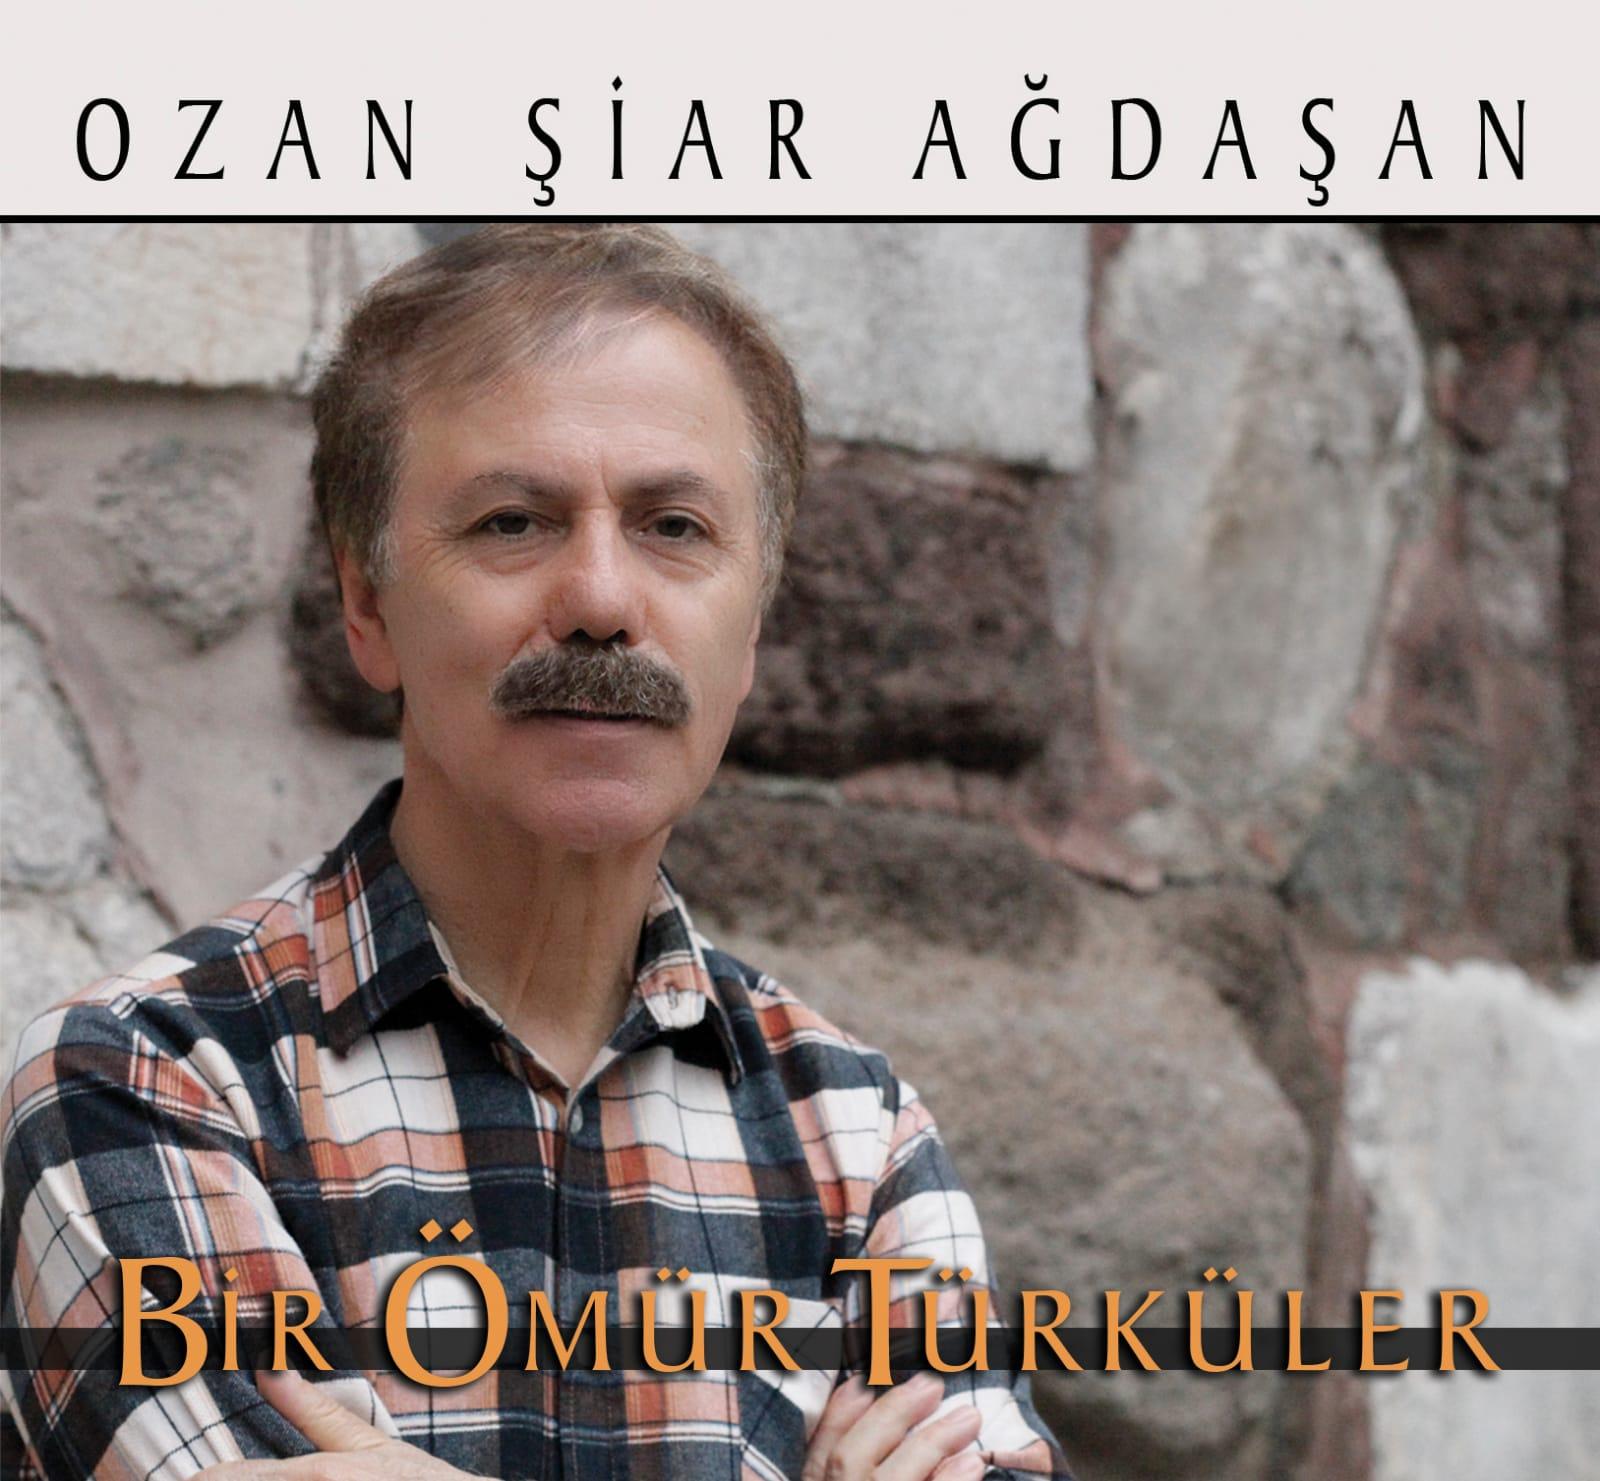 1 Devrimci Aleviler DAB Ozan Şah Turna WhatsApp Image 2020-07-04 at 23.42.07